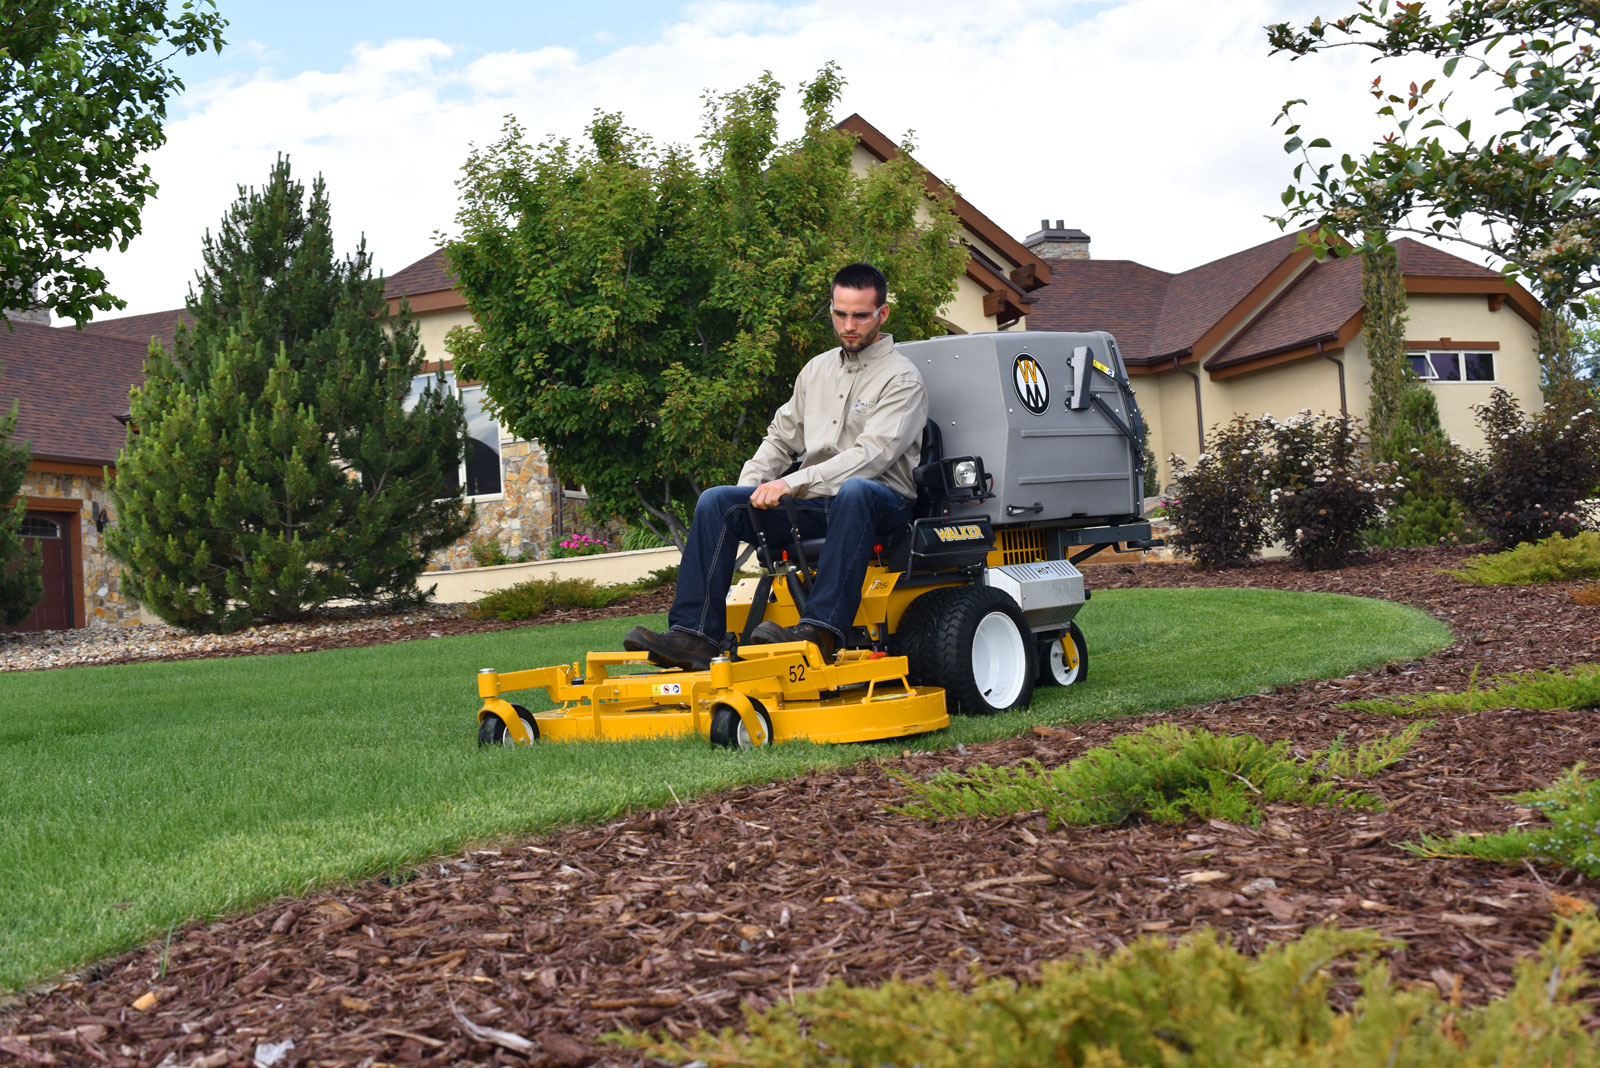 The Walker Model T25i Commercial Lawn Mower